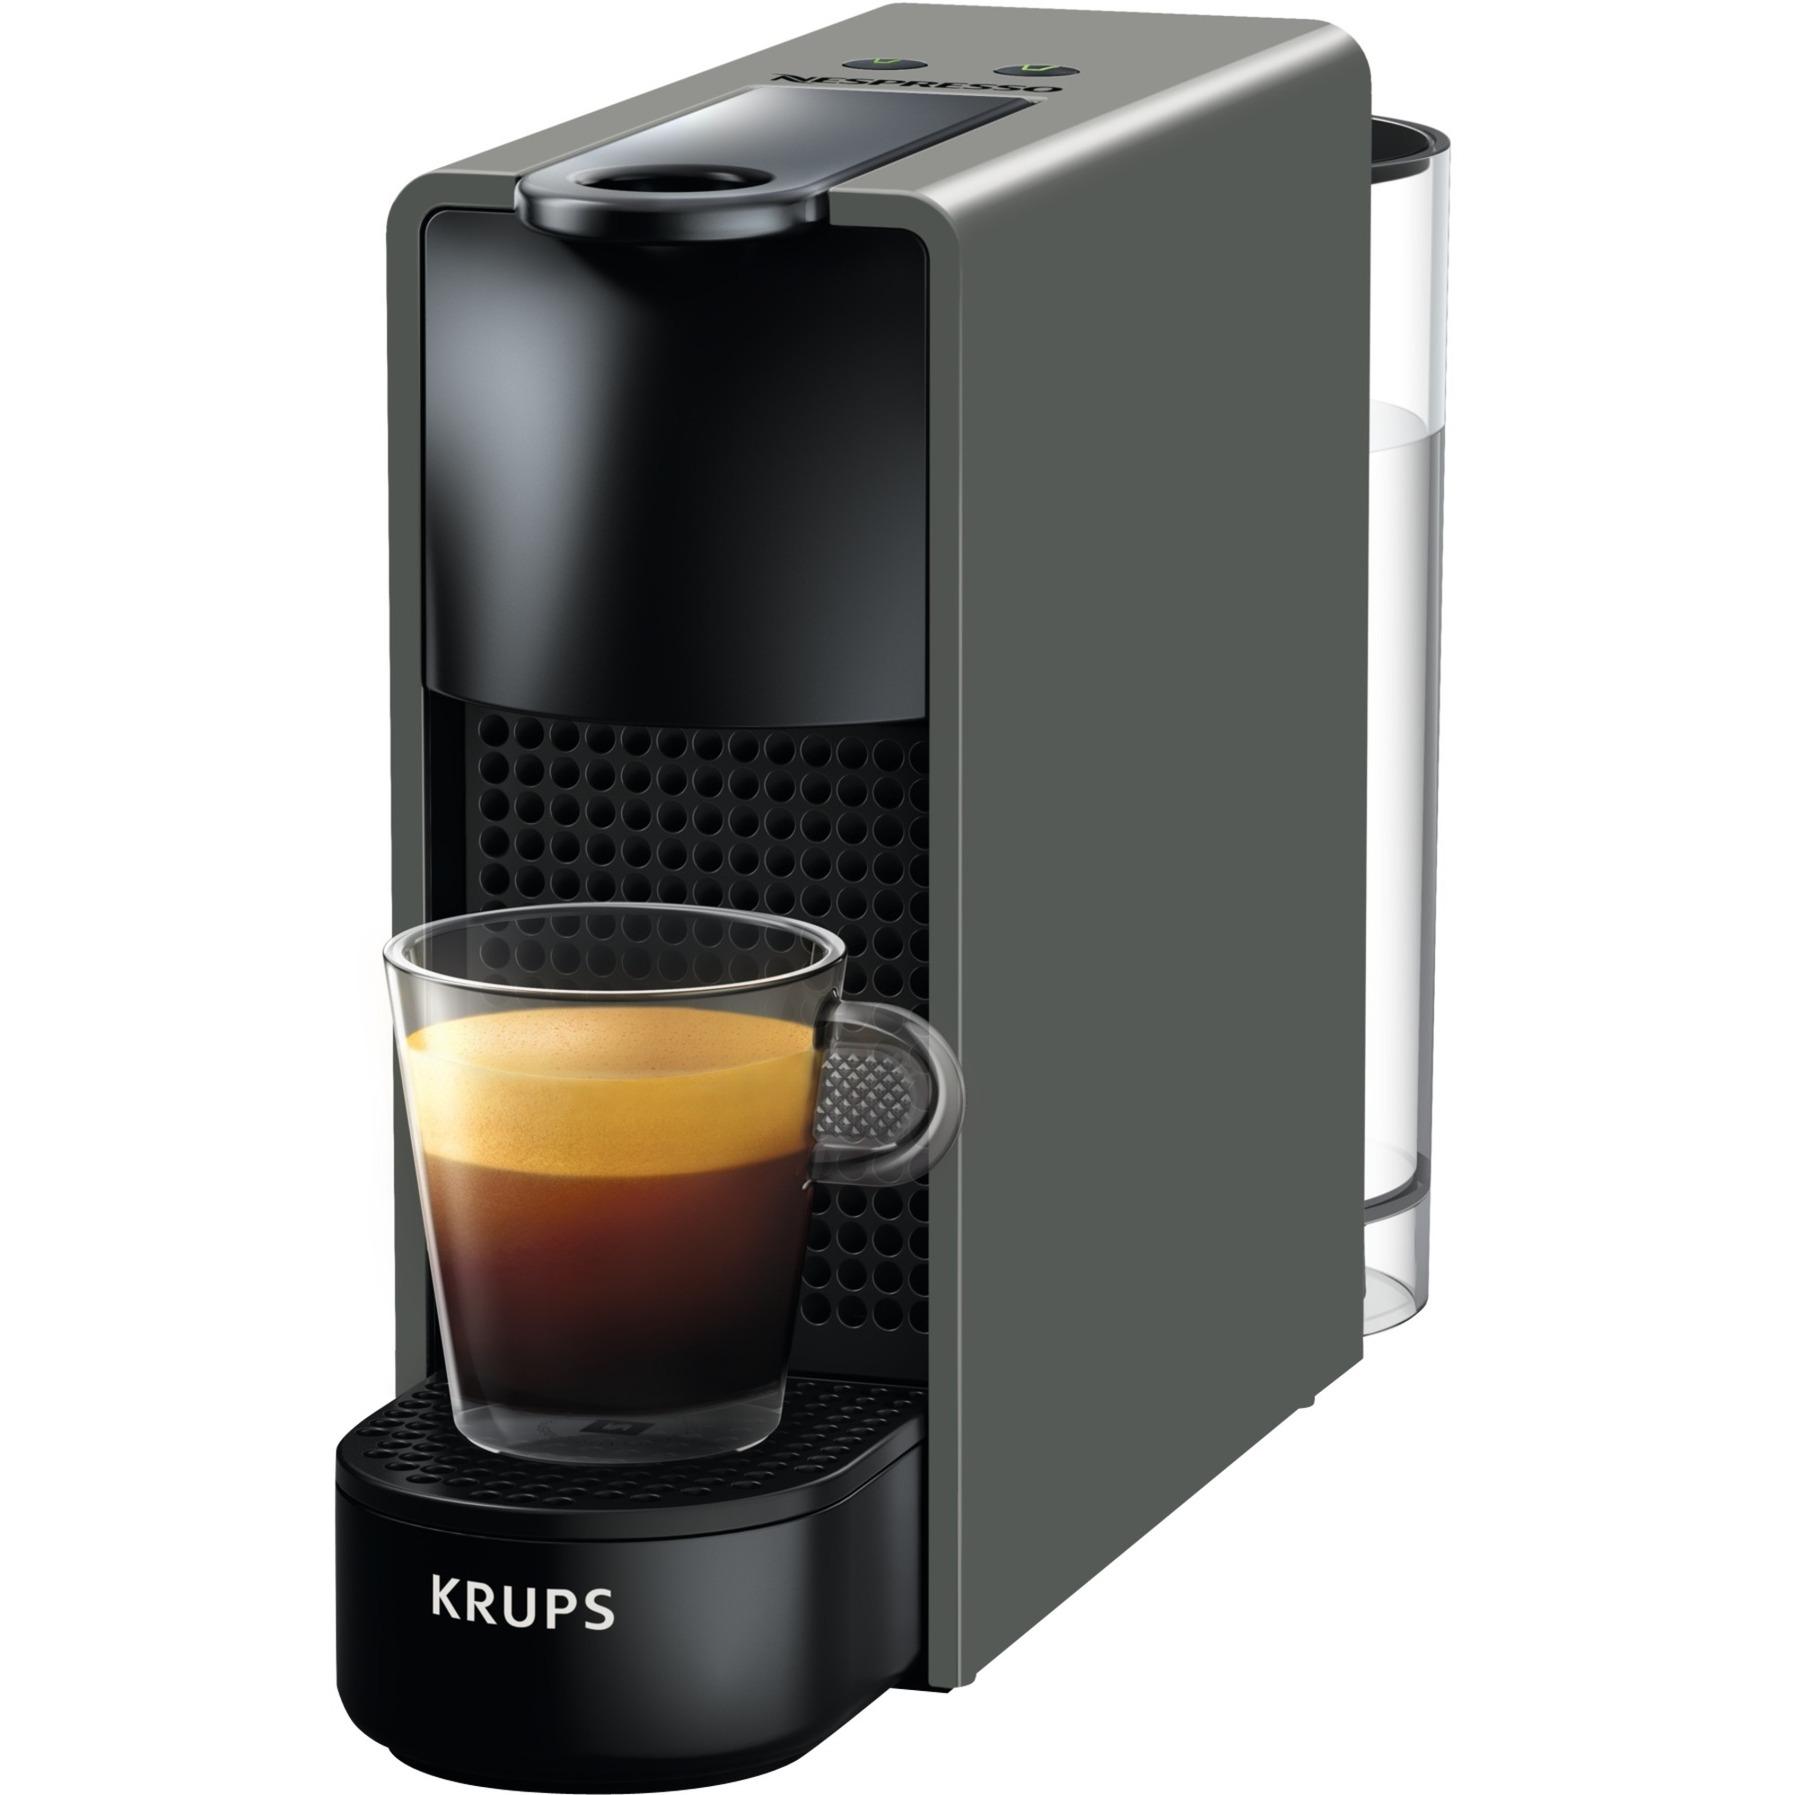 Essenza Mini XN110B10 Independiente Manual Máquina de café en cápsulas 0.6L 1tazas Negro, Gris, Cafetera de cápsulas